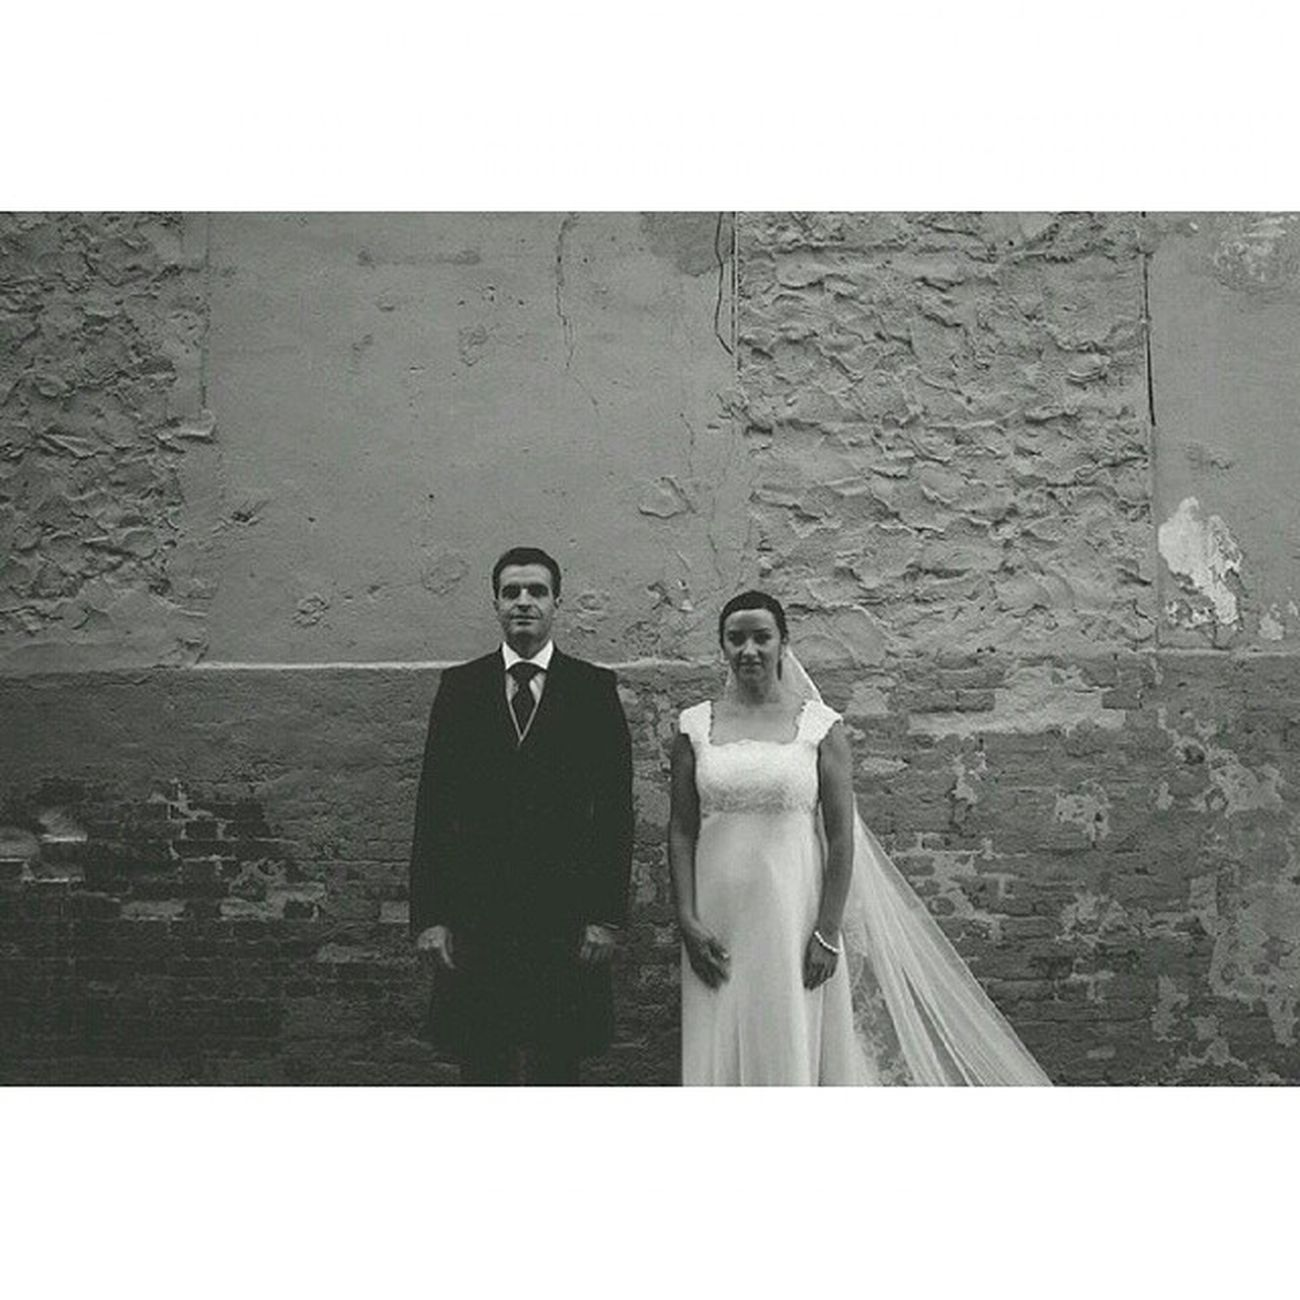 Rocío y Jose Boda Postboda Wedddingphotographer Fotografia Malaga Fotografodebodasenmalaga Fotografiadebodas Fotografiadebodasenblancoynegro Blancoynegro Fotografiaenblancoynegro Blackandwhite B &w Novia Novios Bride Couple